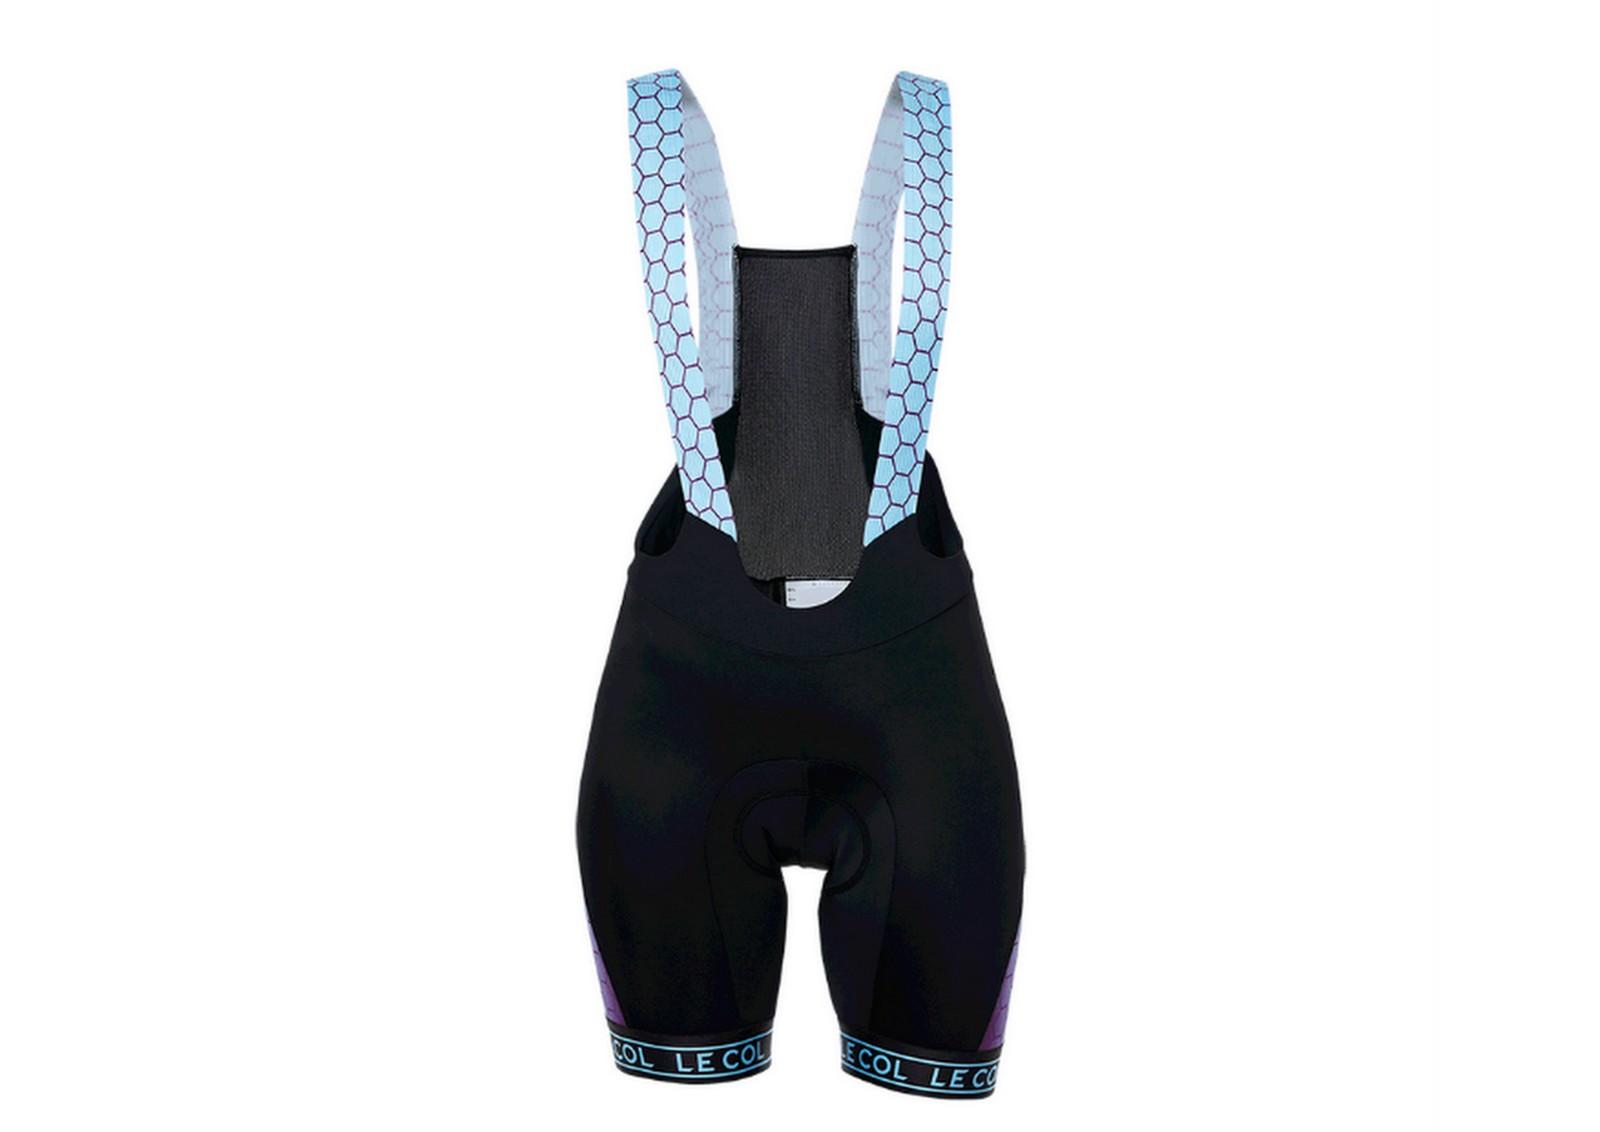 Le Col women s HC sky blue hex bib shorts review - Cycling Weekly 9d5e92bfa